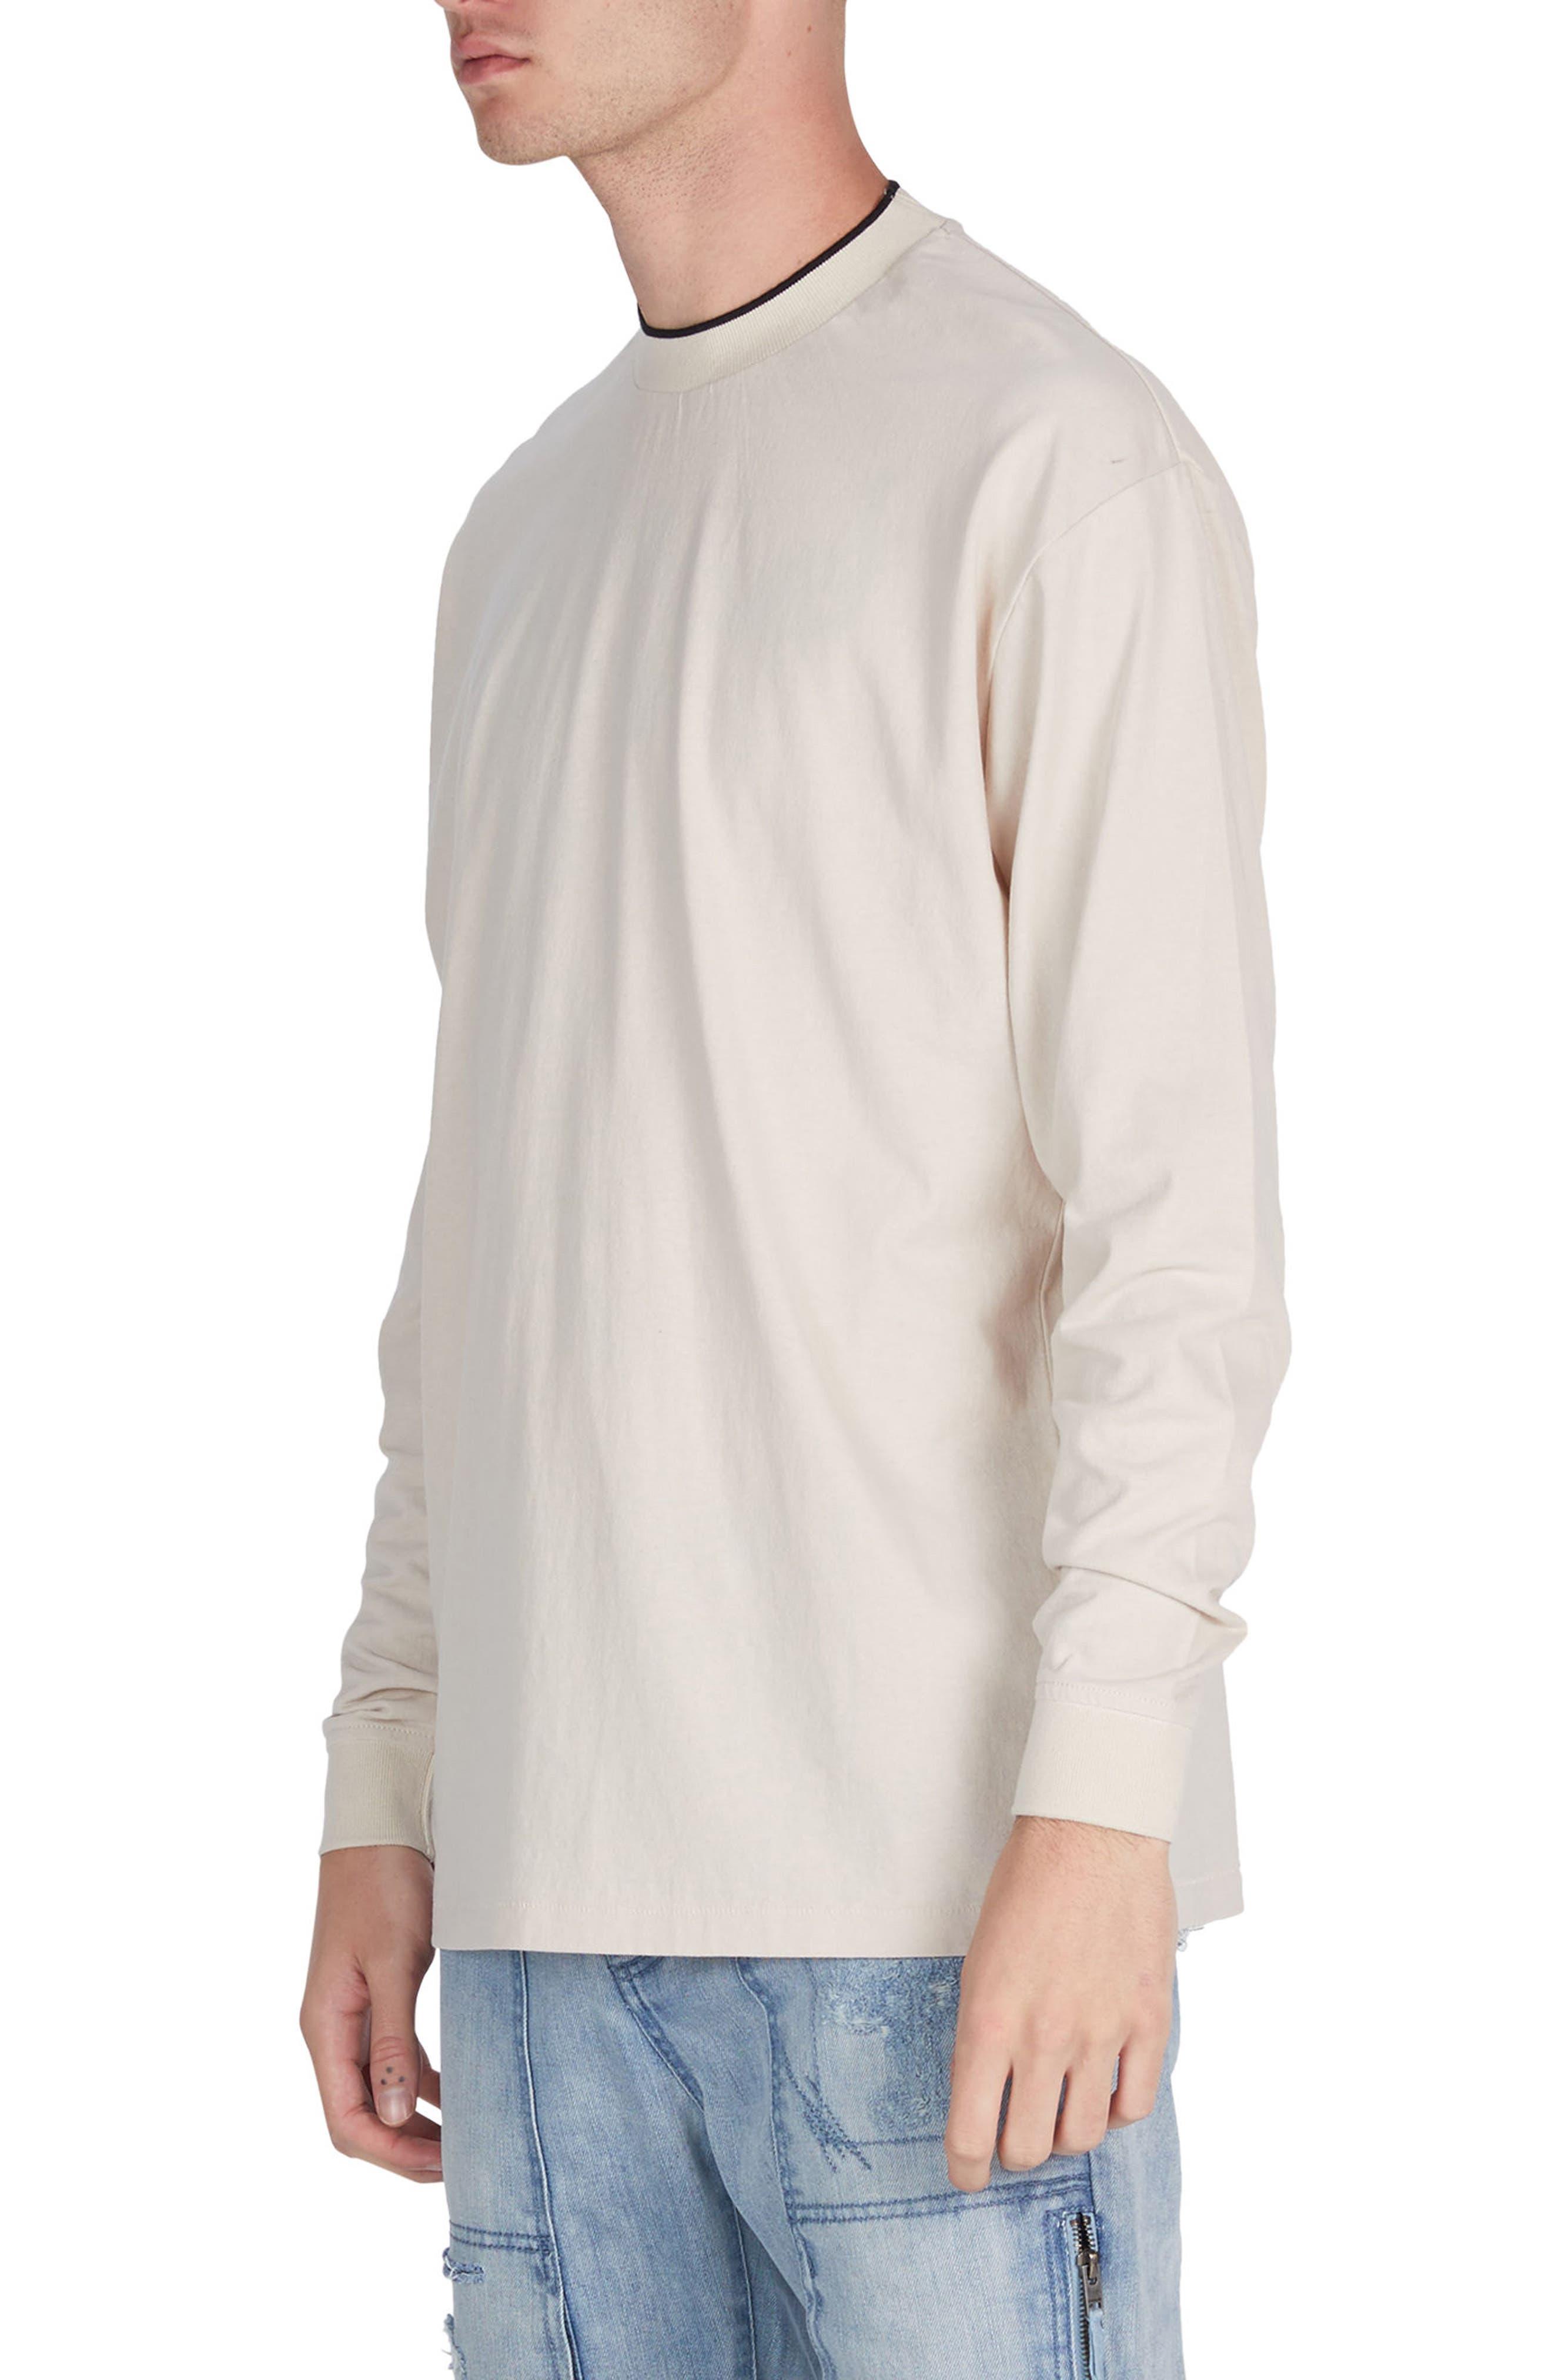 Tipped Boxy T-Shirt,                             Alternate thumbnail 4, color,                             251